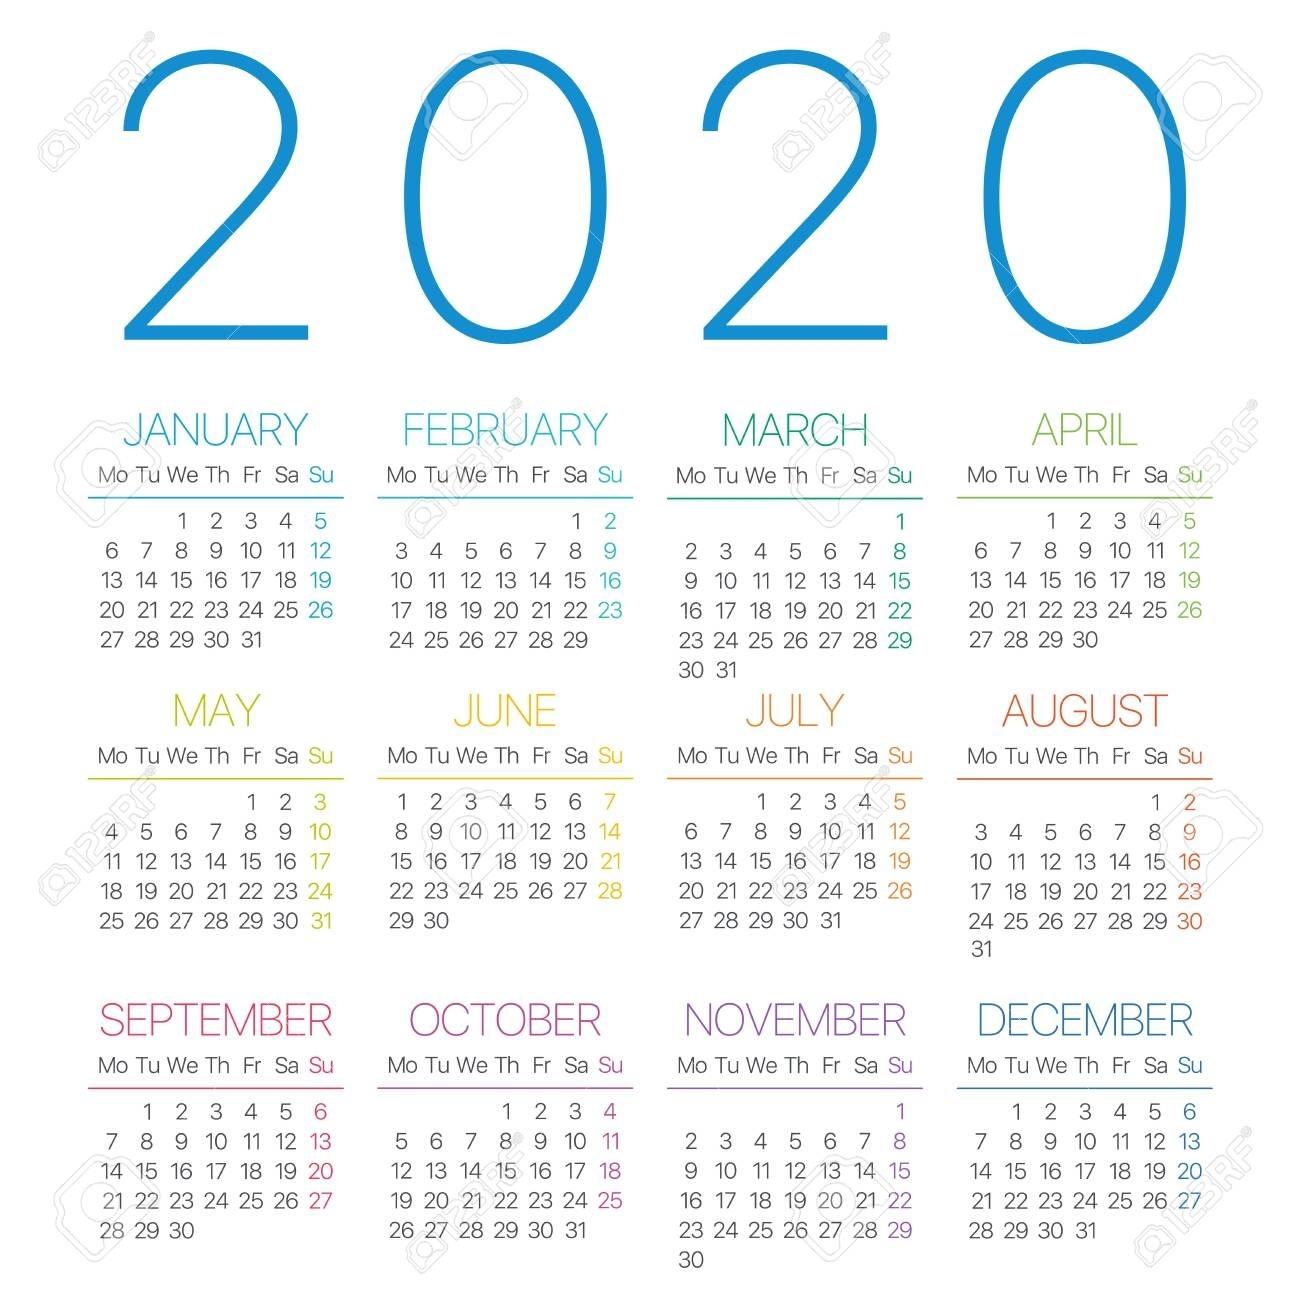 2020 Calendar Thin Line - Monday To Sunday - Vector Template in Monday To Sunday 2020 Calendar